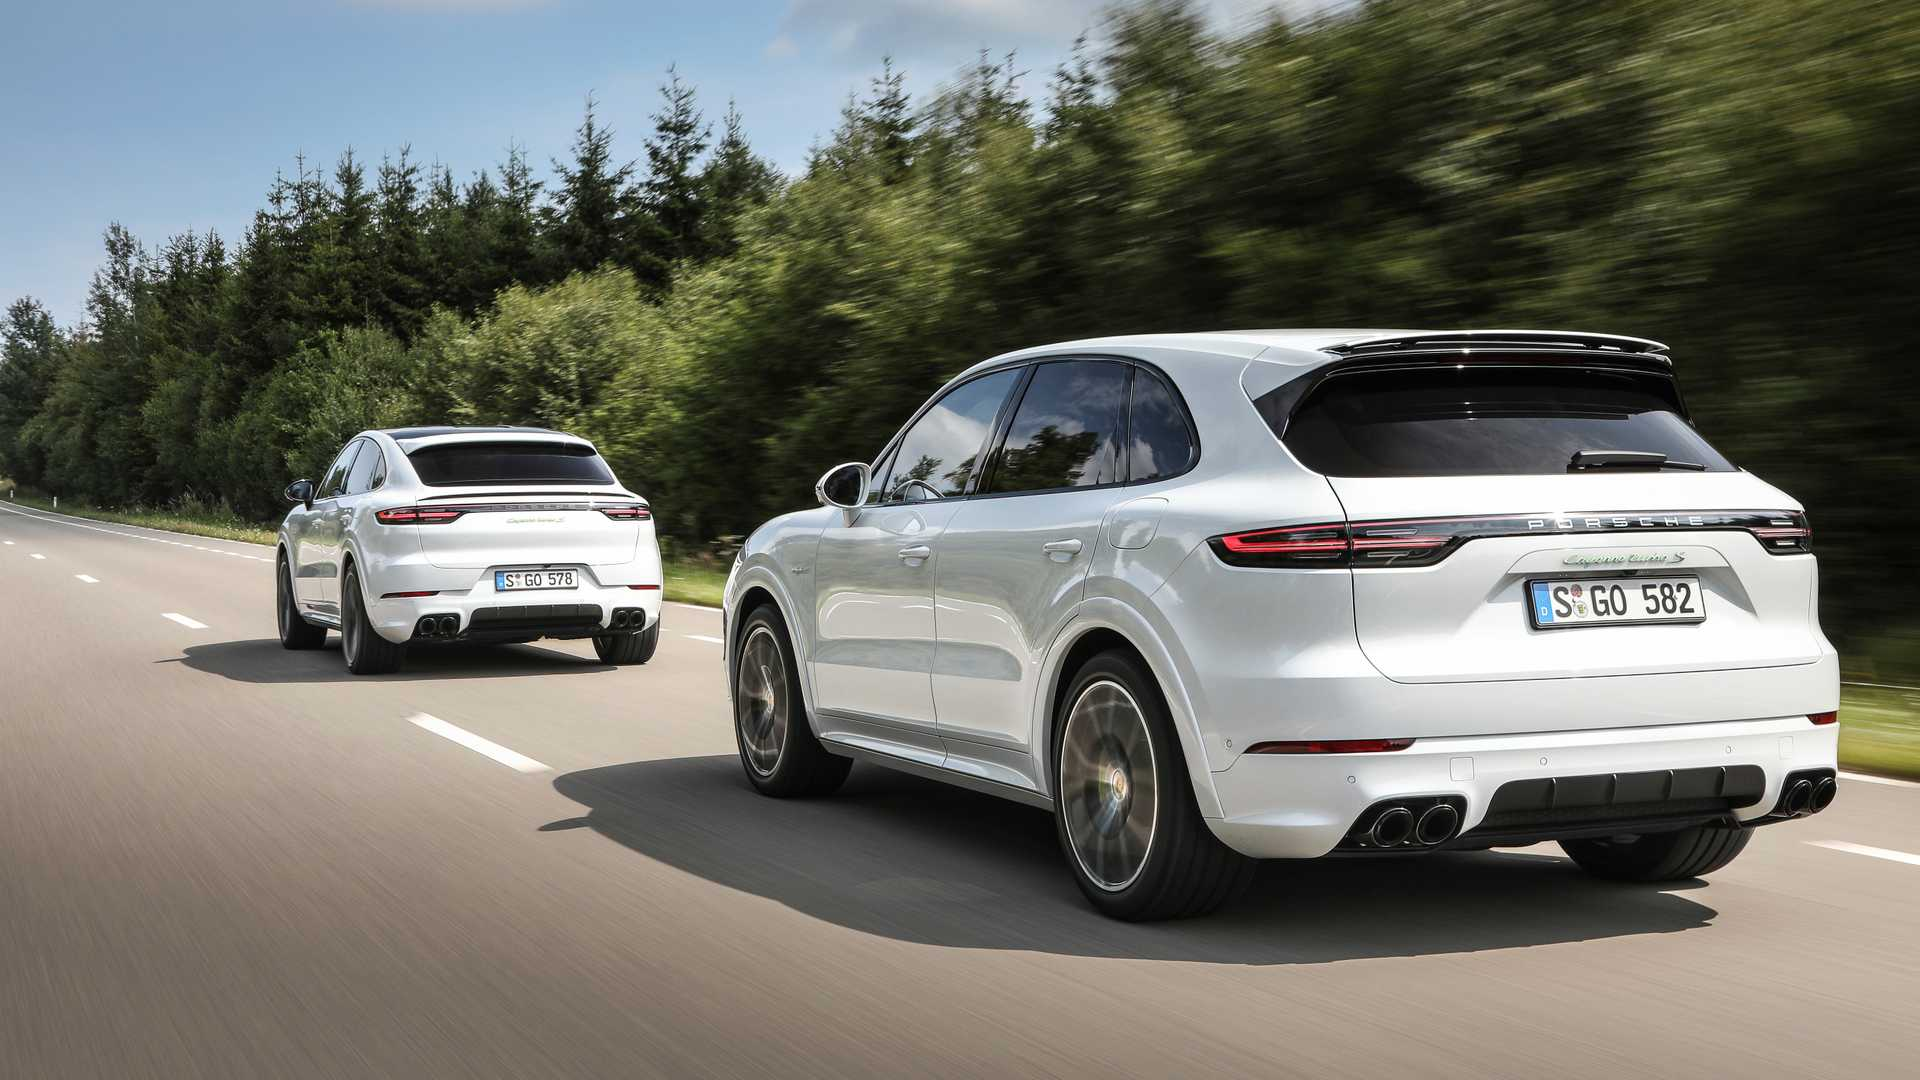 2020-porsche-cayenne-turbo-s-e-hybrid-coupe-turbo-s-e-hybrid-and-coupe-e-hybrid-1